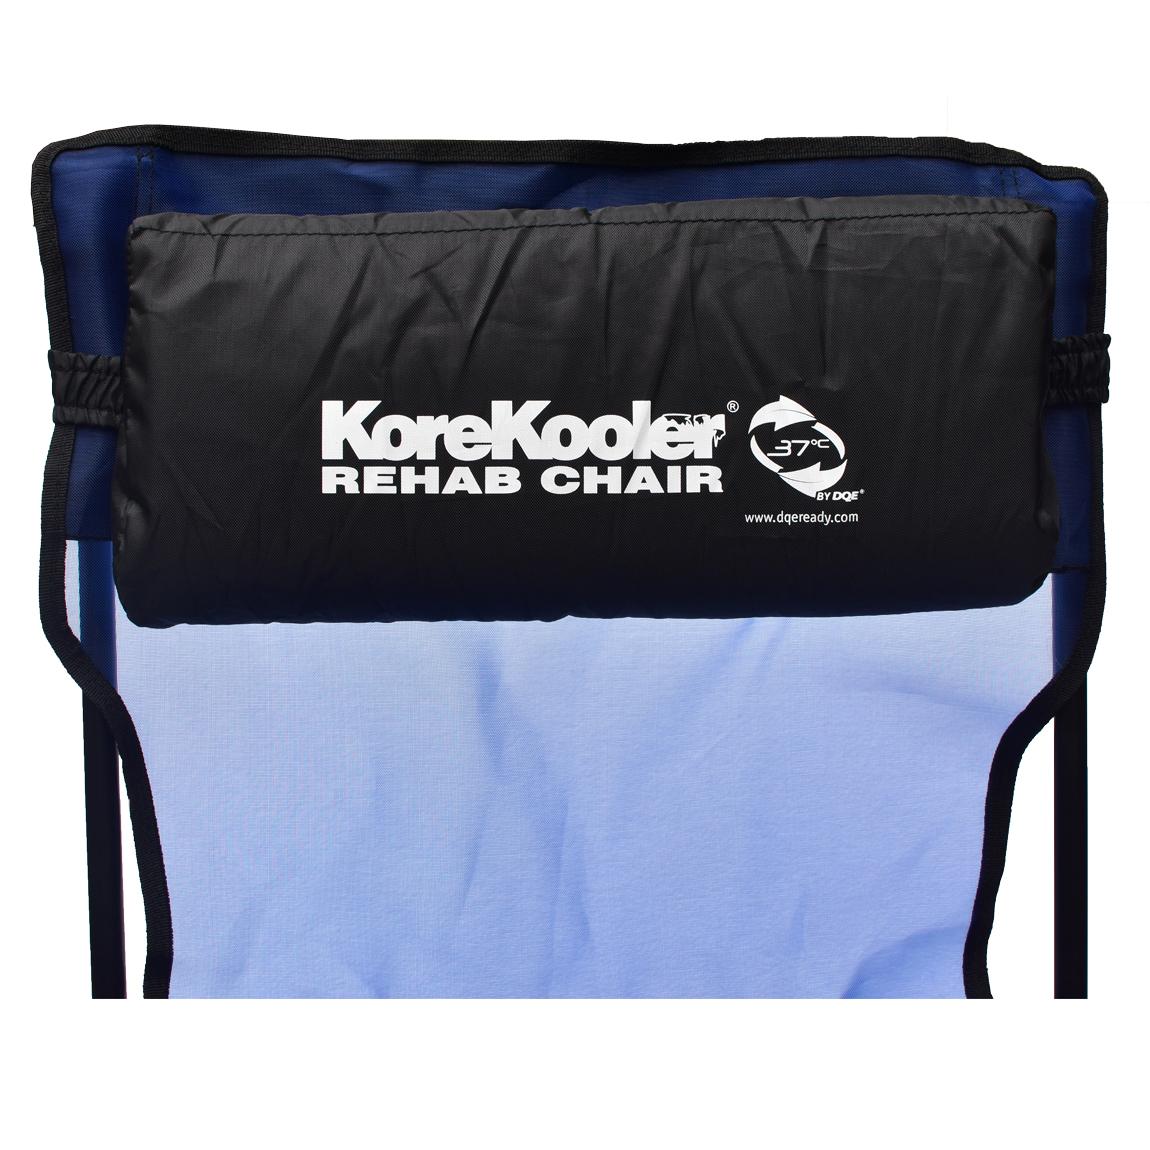 Kore Kooler Chair Headrest image